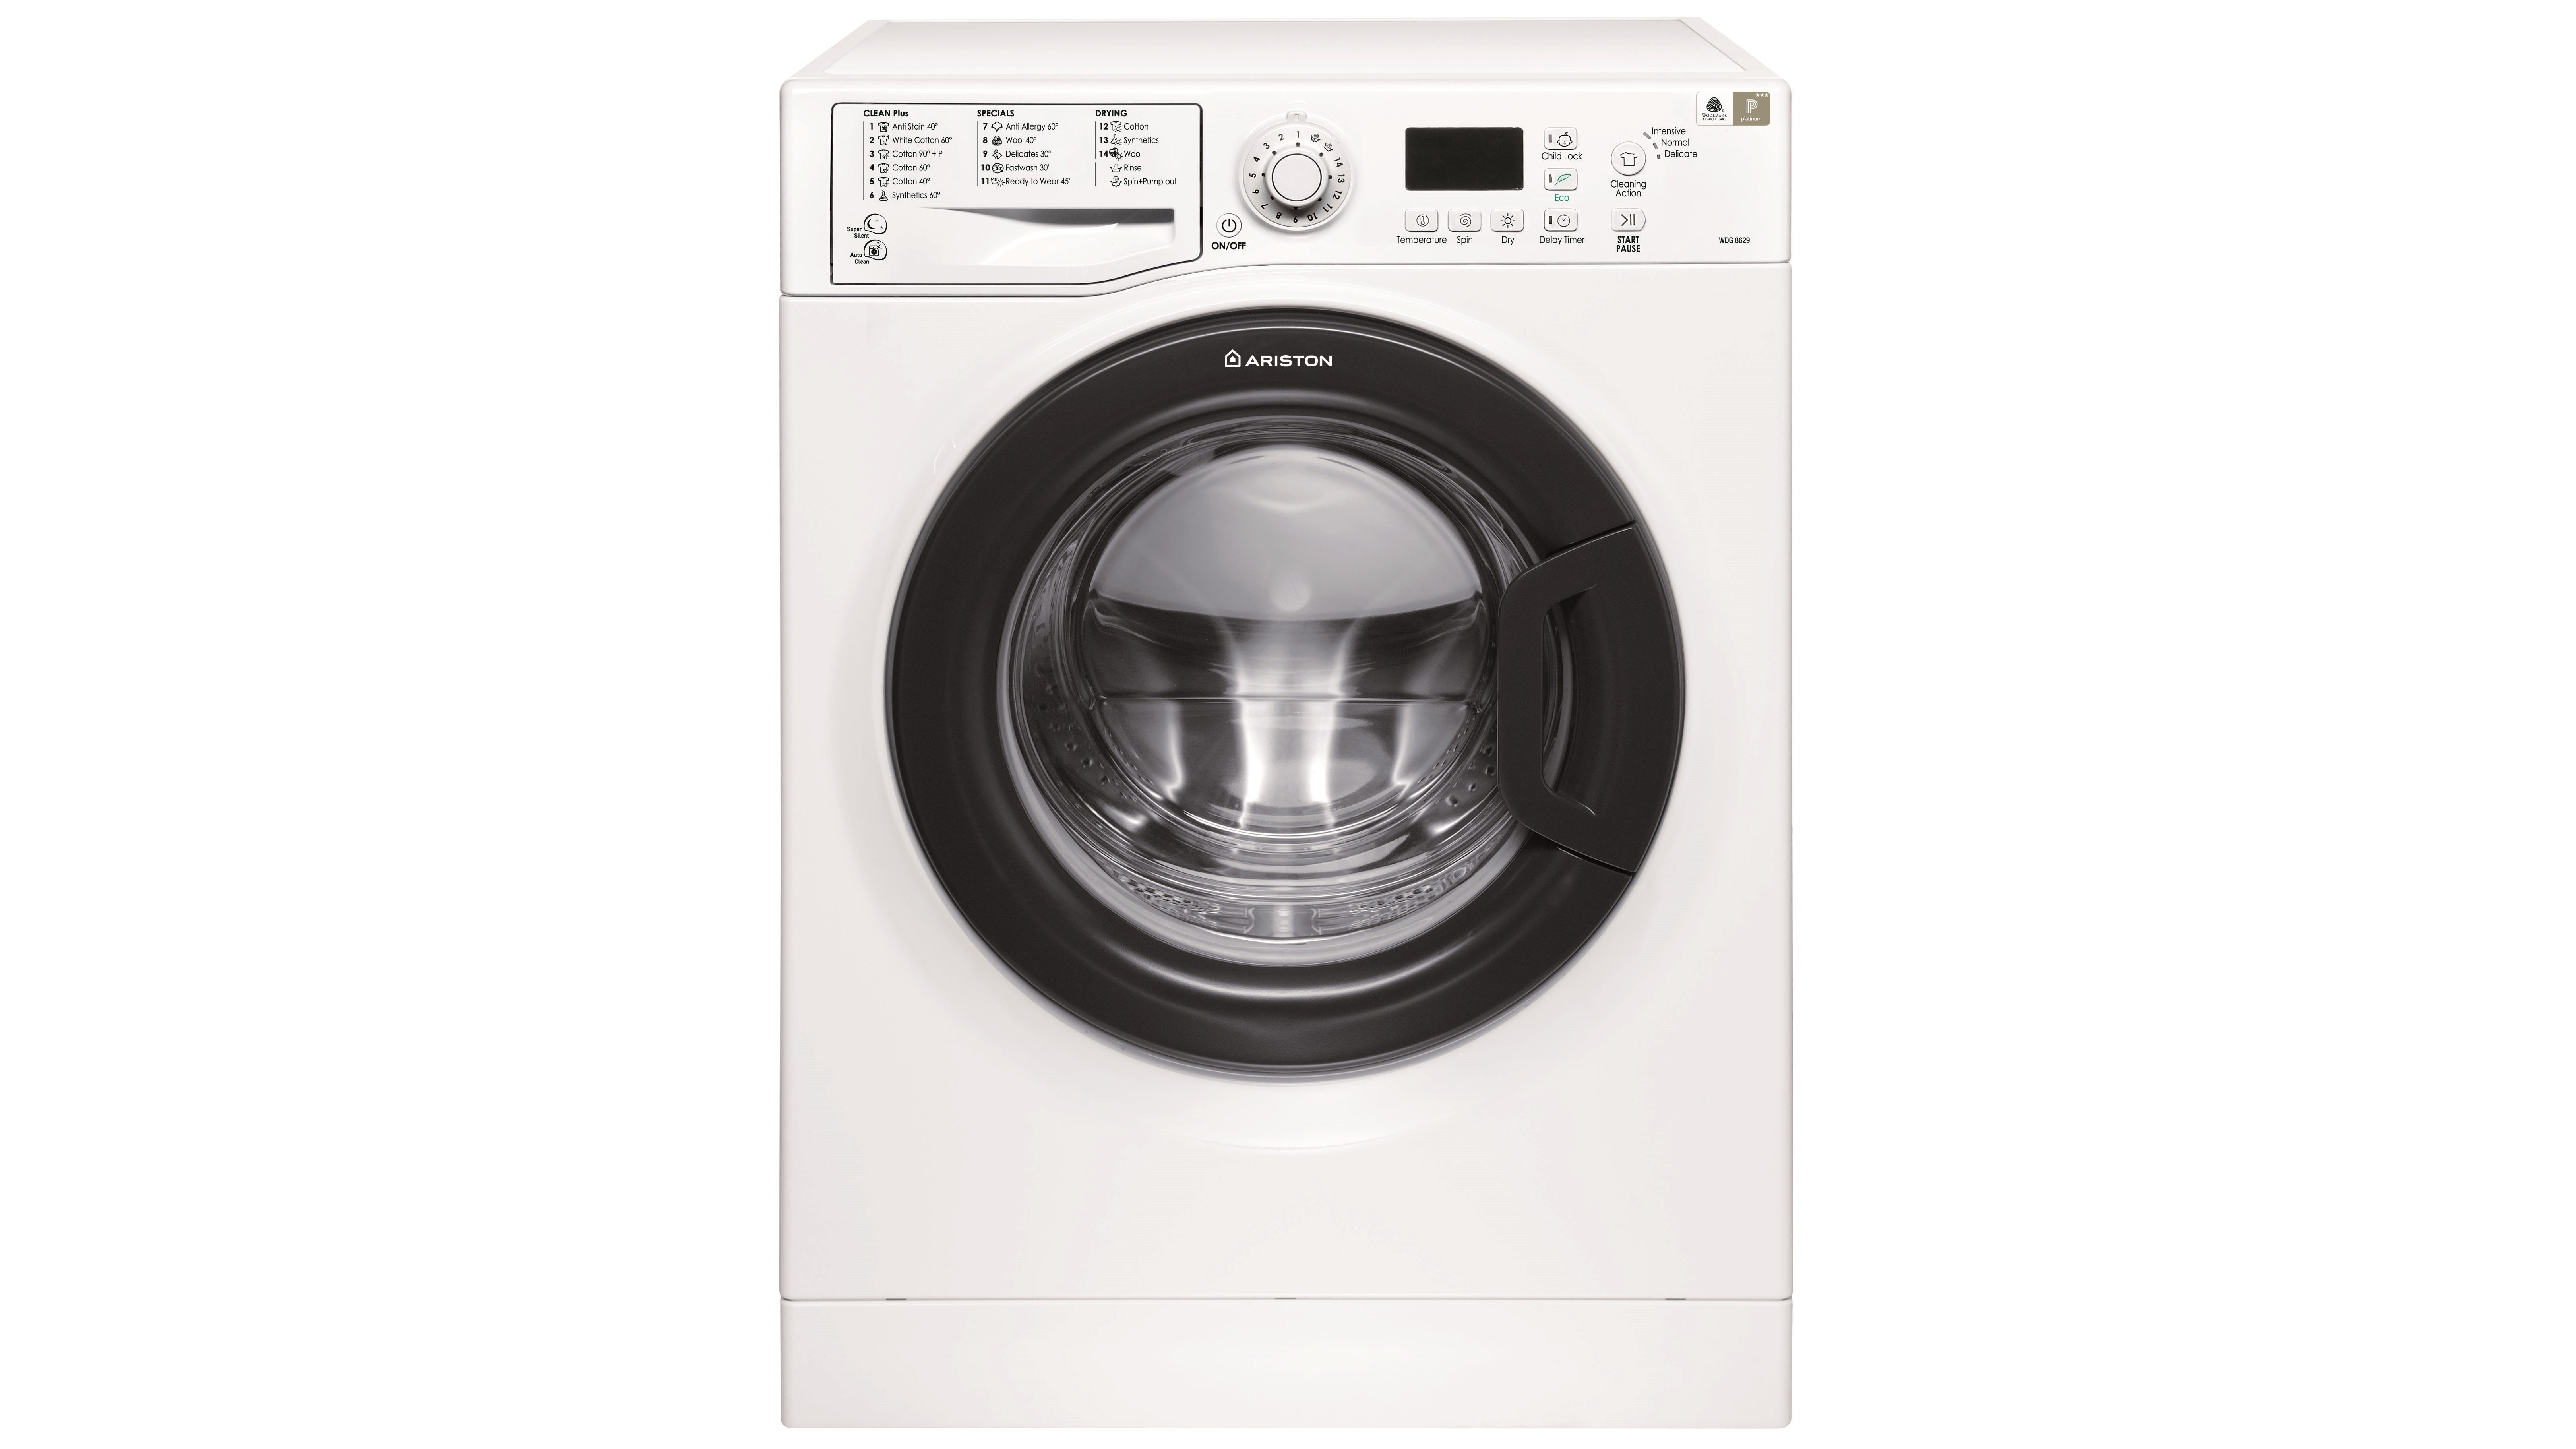 washer and dryer combo machine